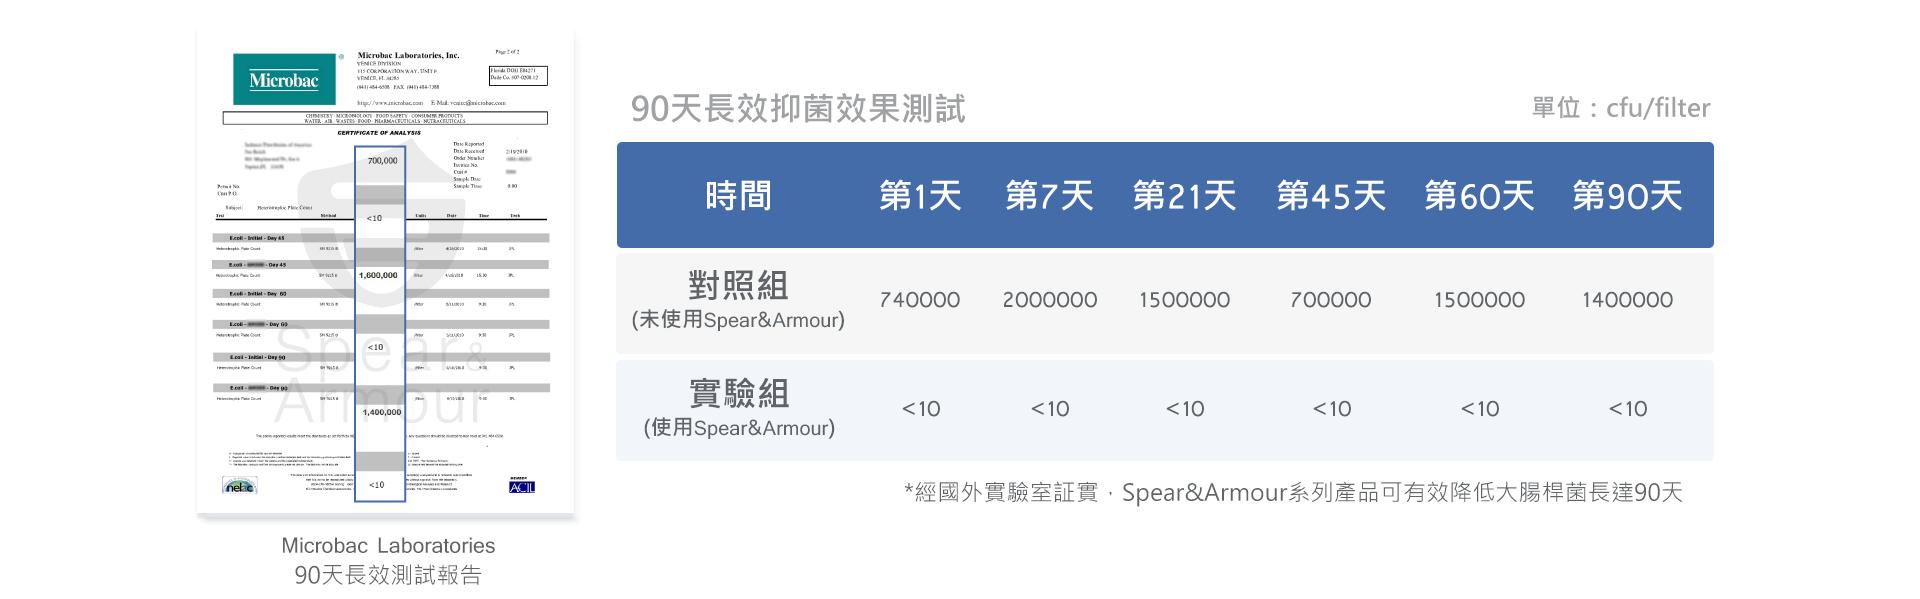 Spear & Armour 思必兒系列產品可有效減少大腸桿菌(E.coli)長達90天